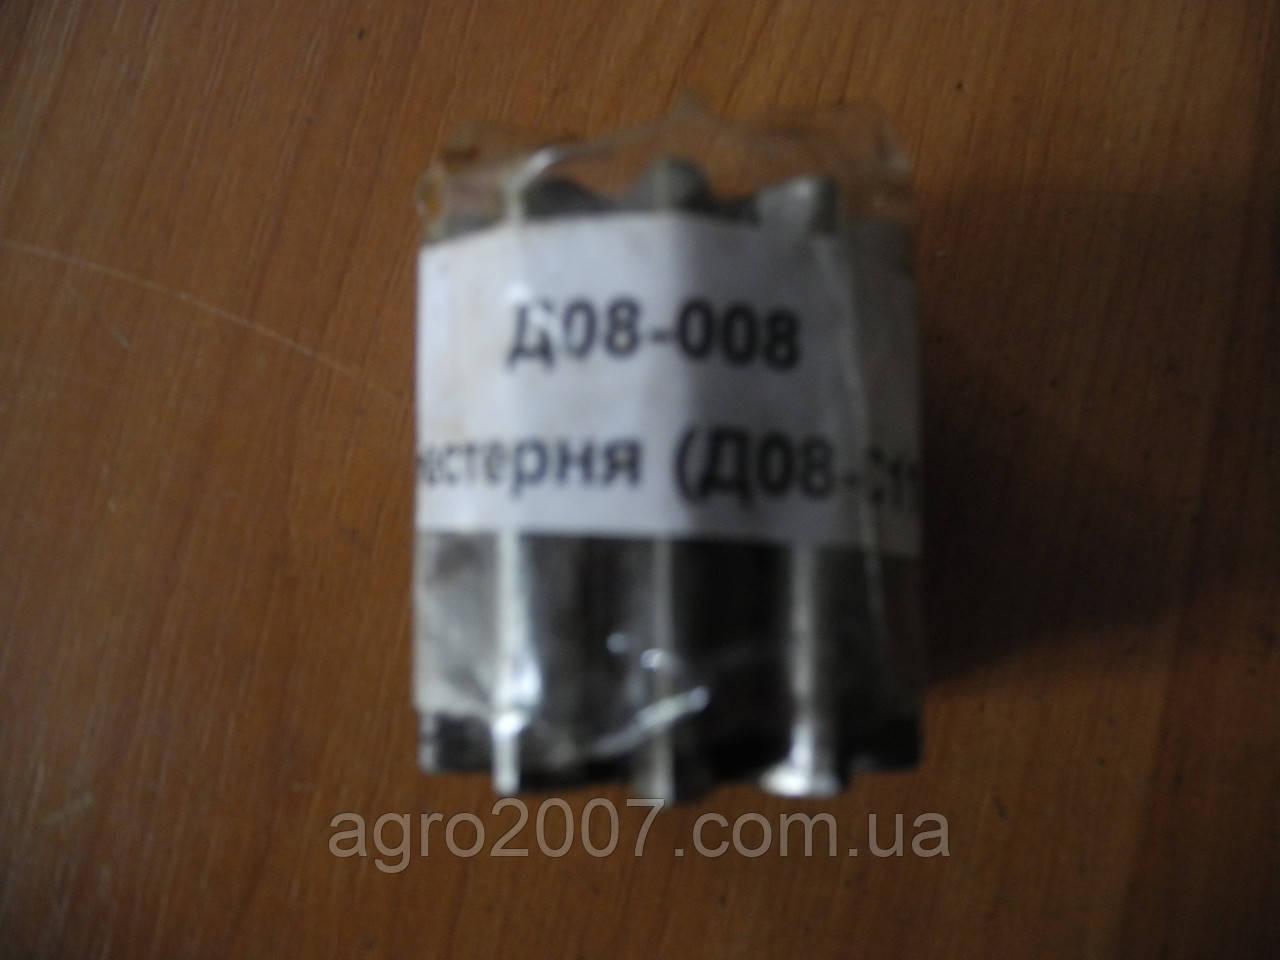 Д08-008 Шестерня (Д08-С11) привода масляного насоса ЮМЗ